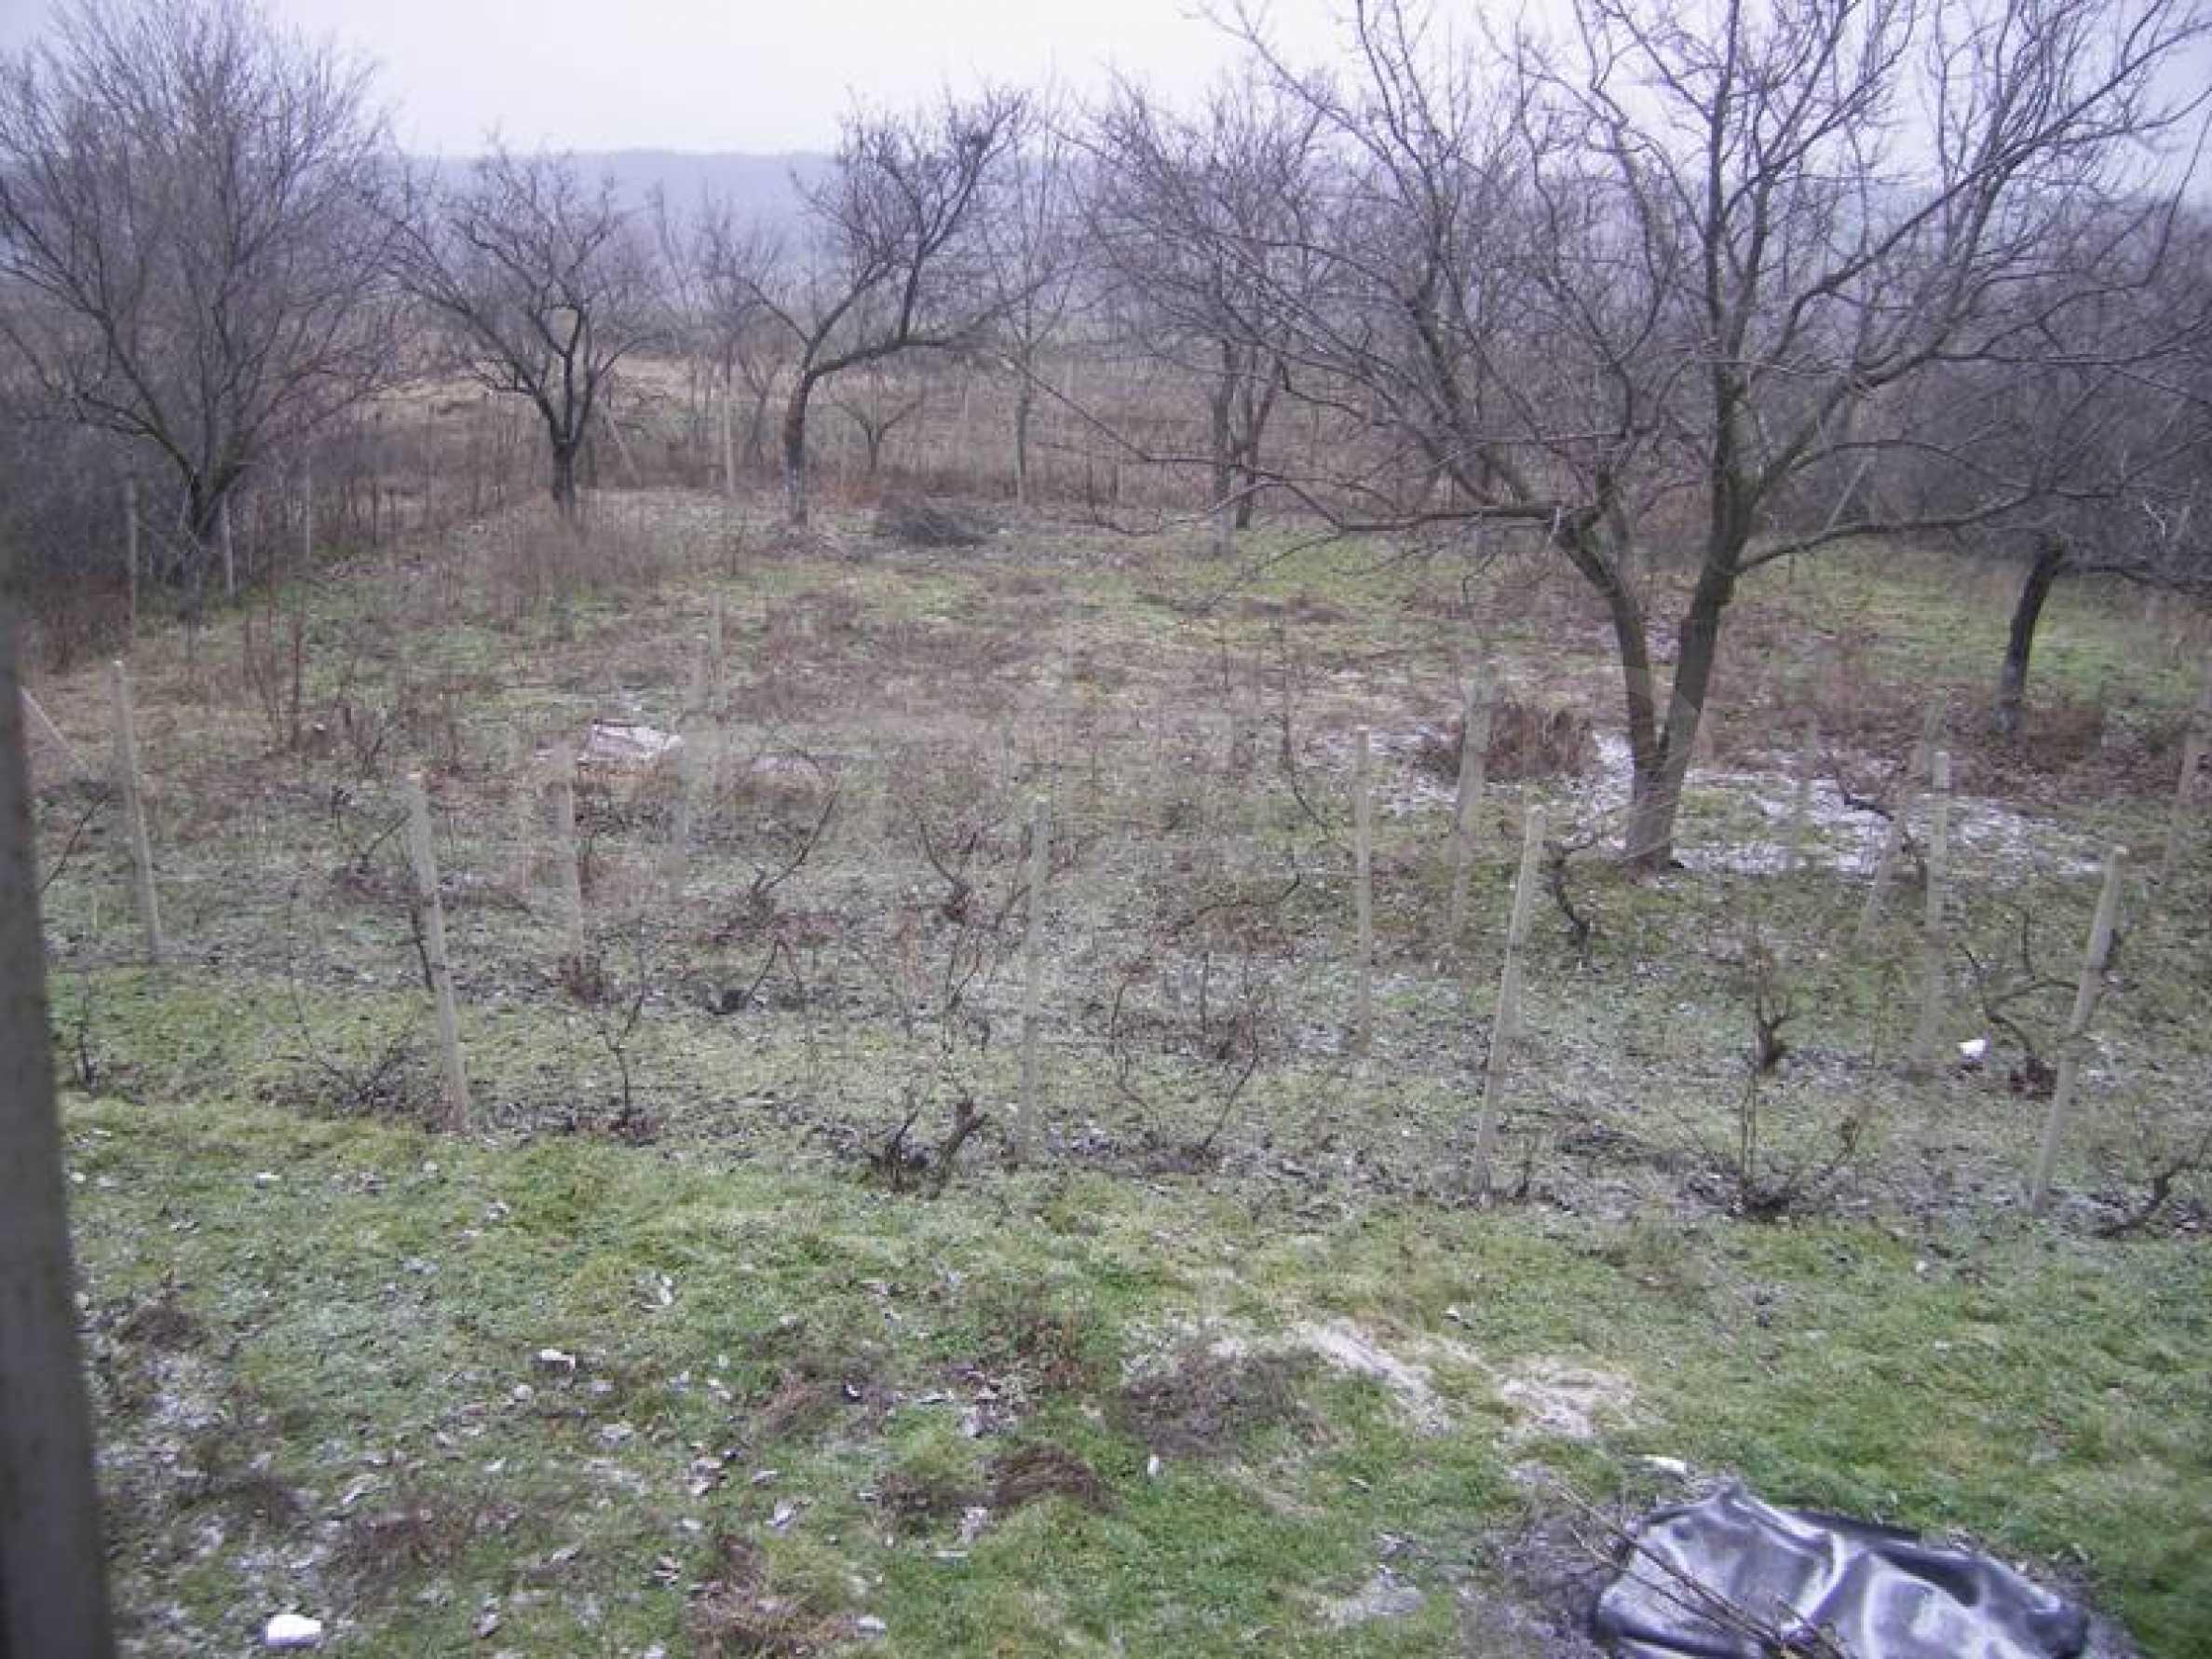 House for sale in Shtarklevo village 4